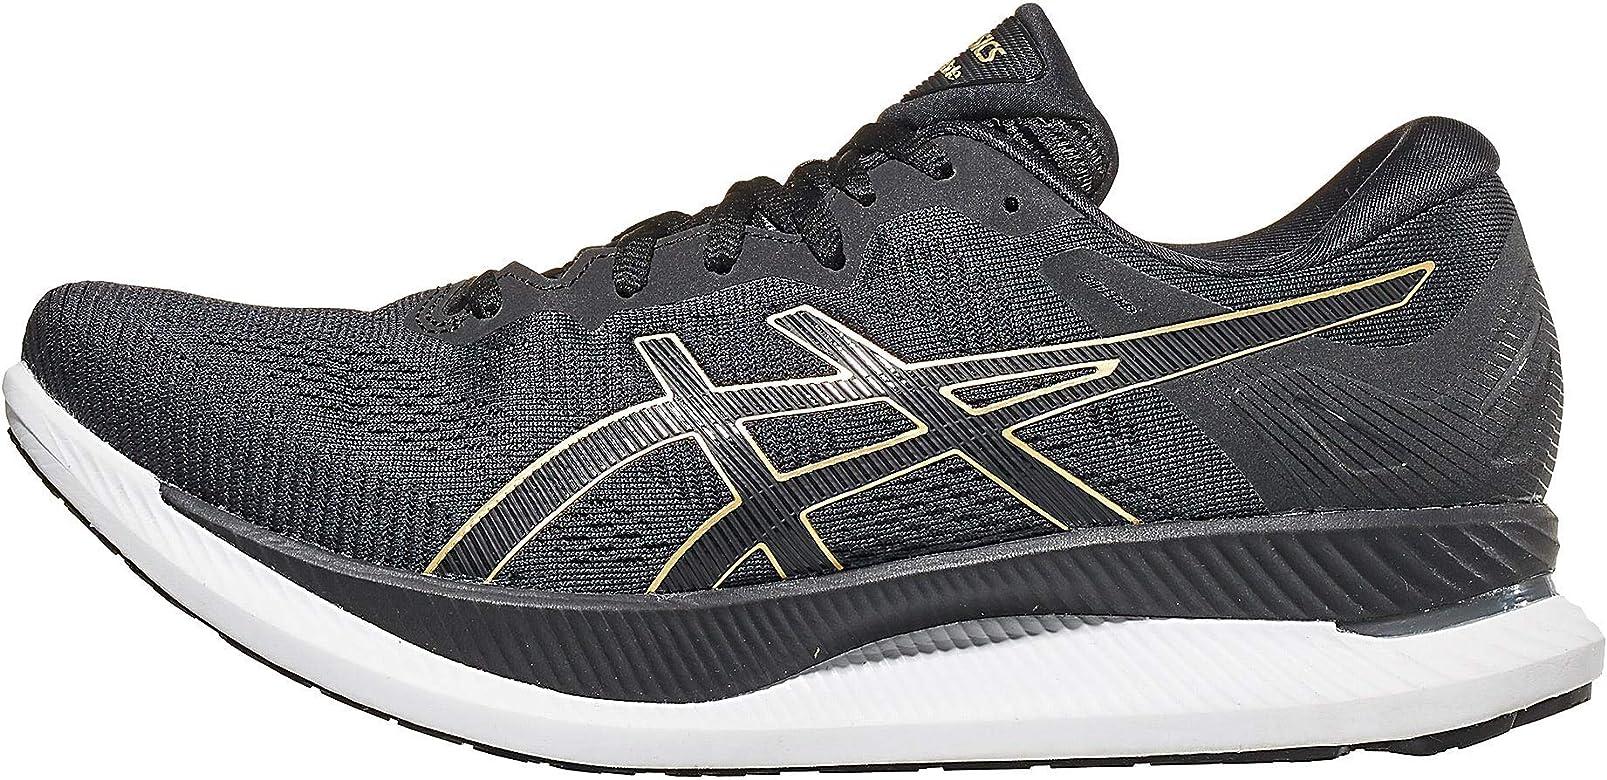 ASICS Mens GlideRide Running Shoes: Amazon.es: Zapatos y complementos